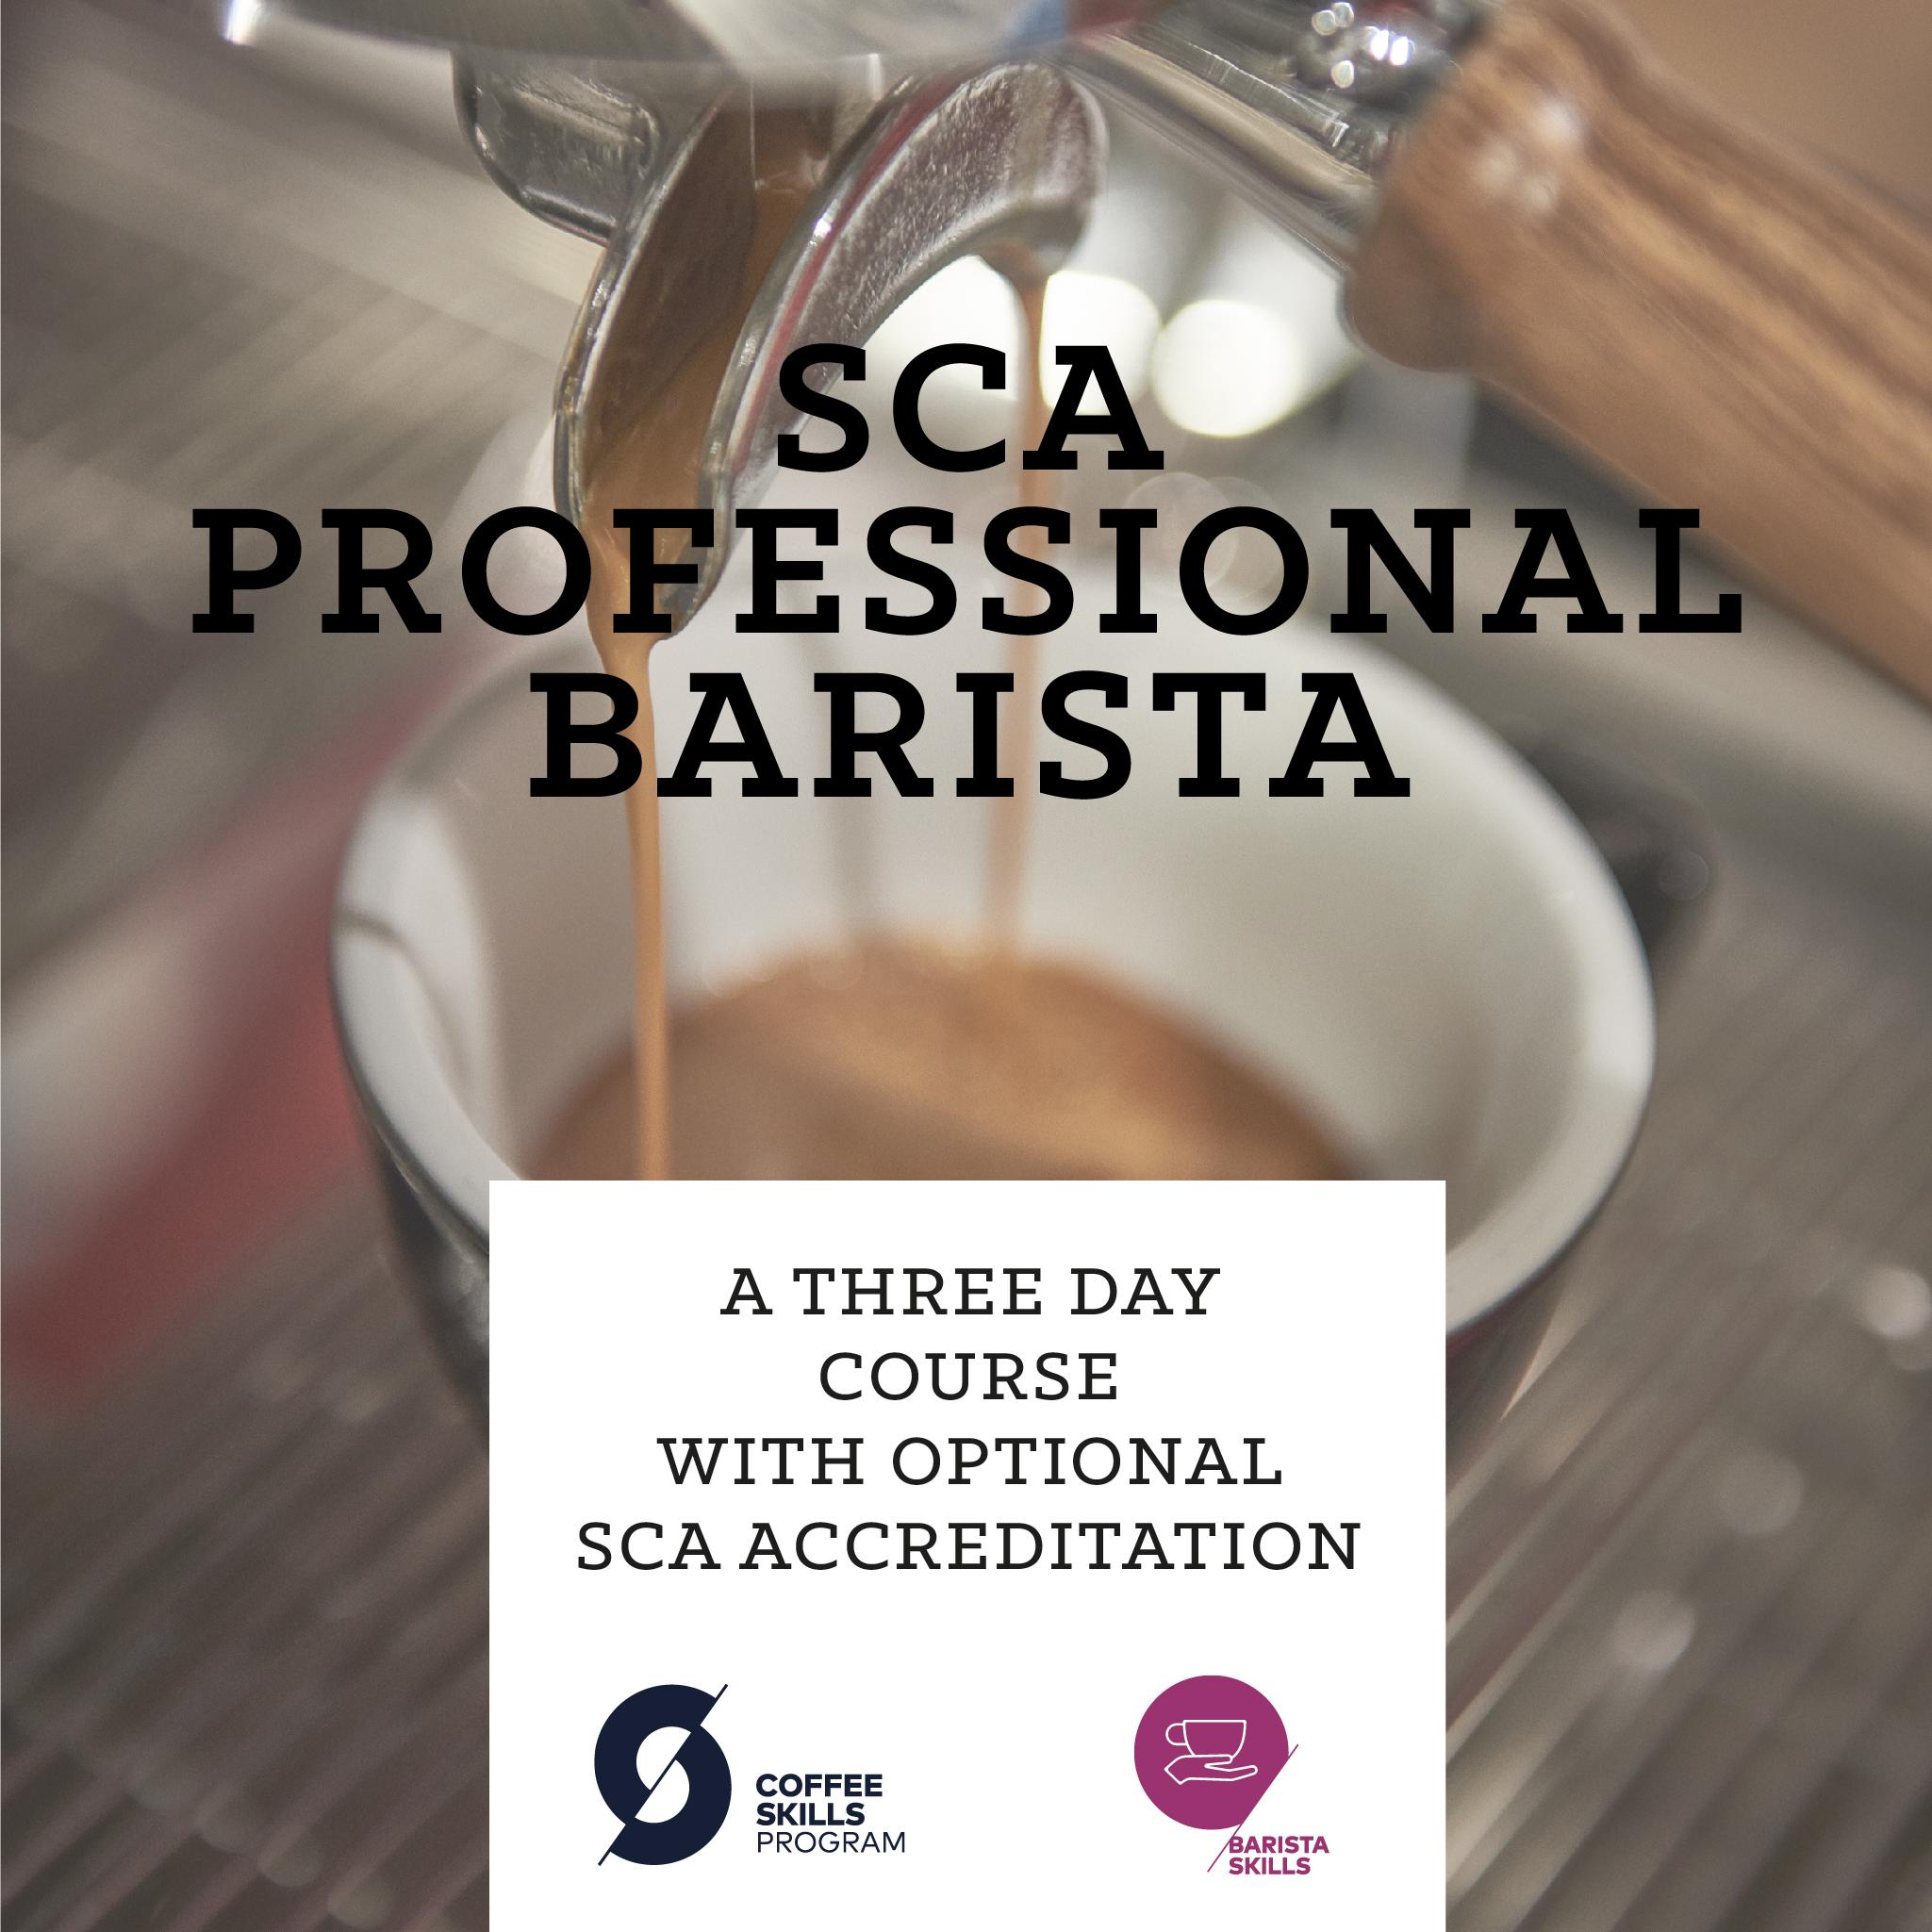 SCA Professional Barista